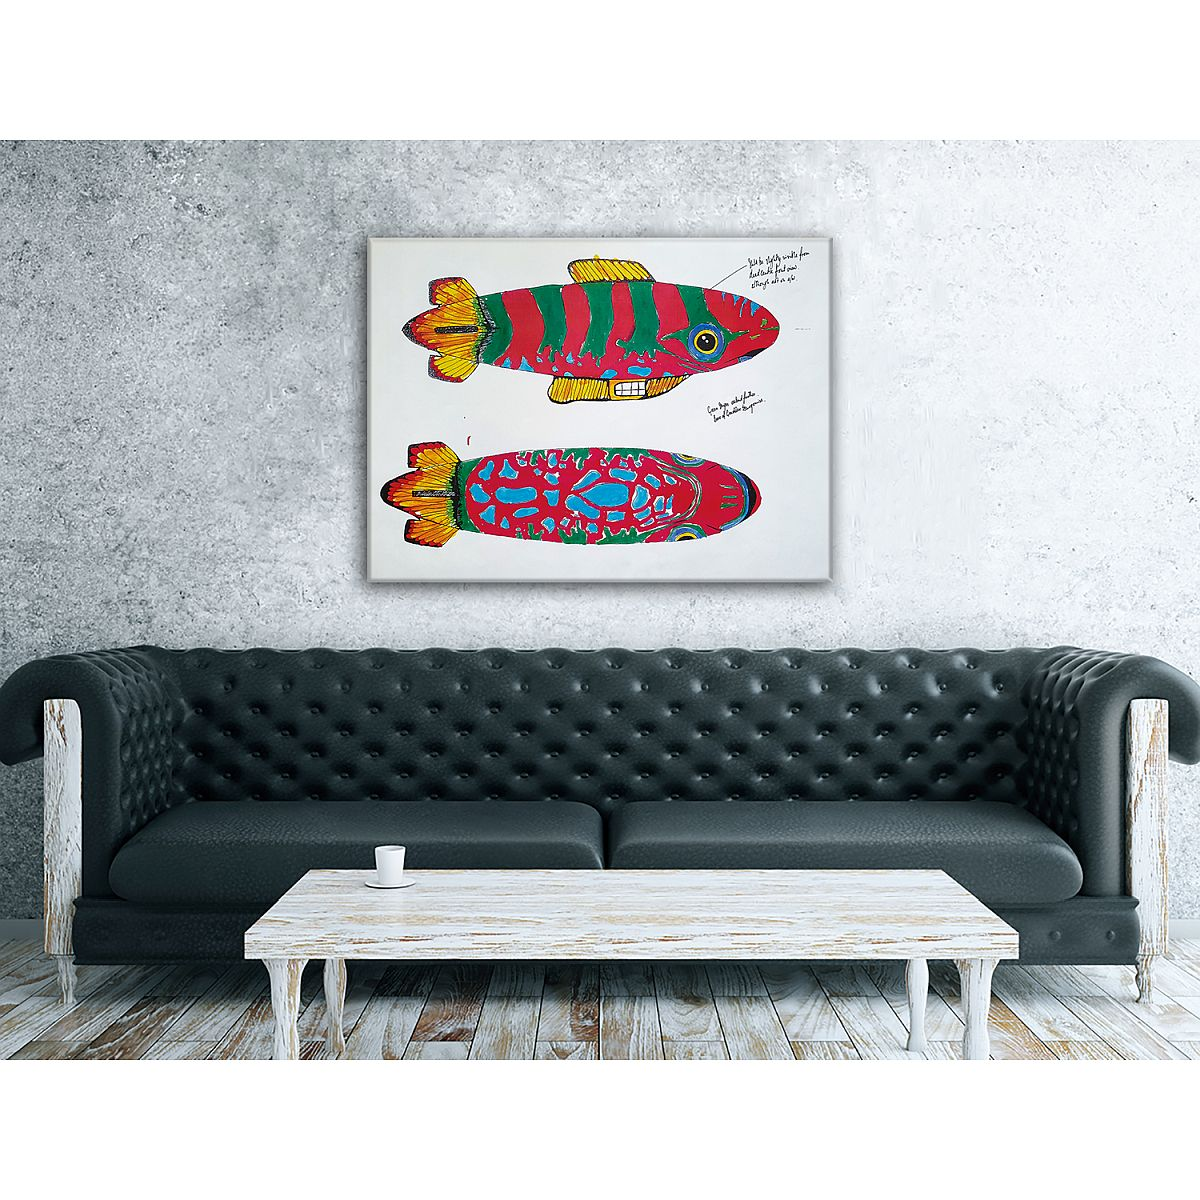 Blimp Sketches Wall Art